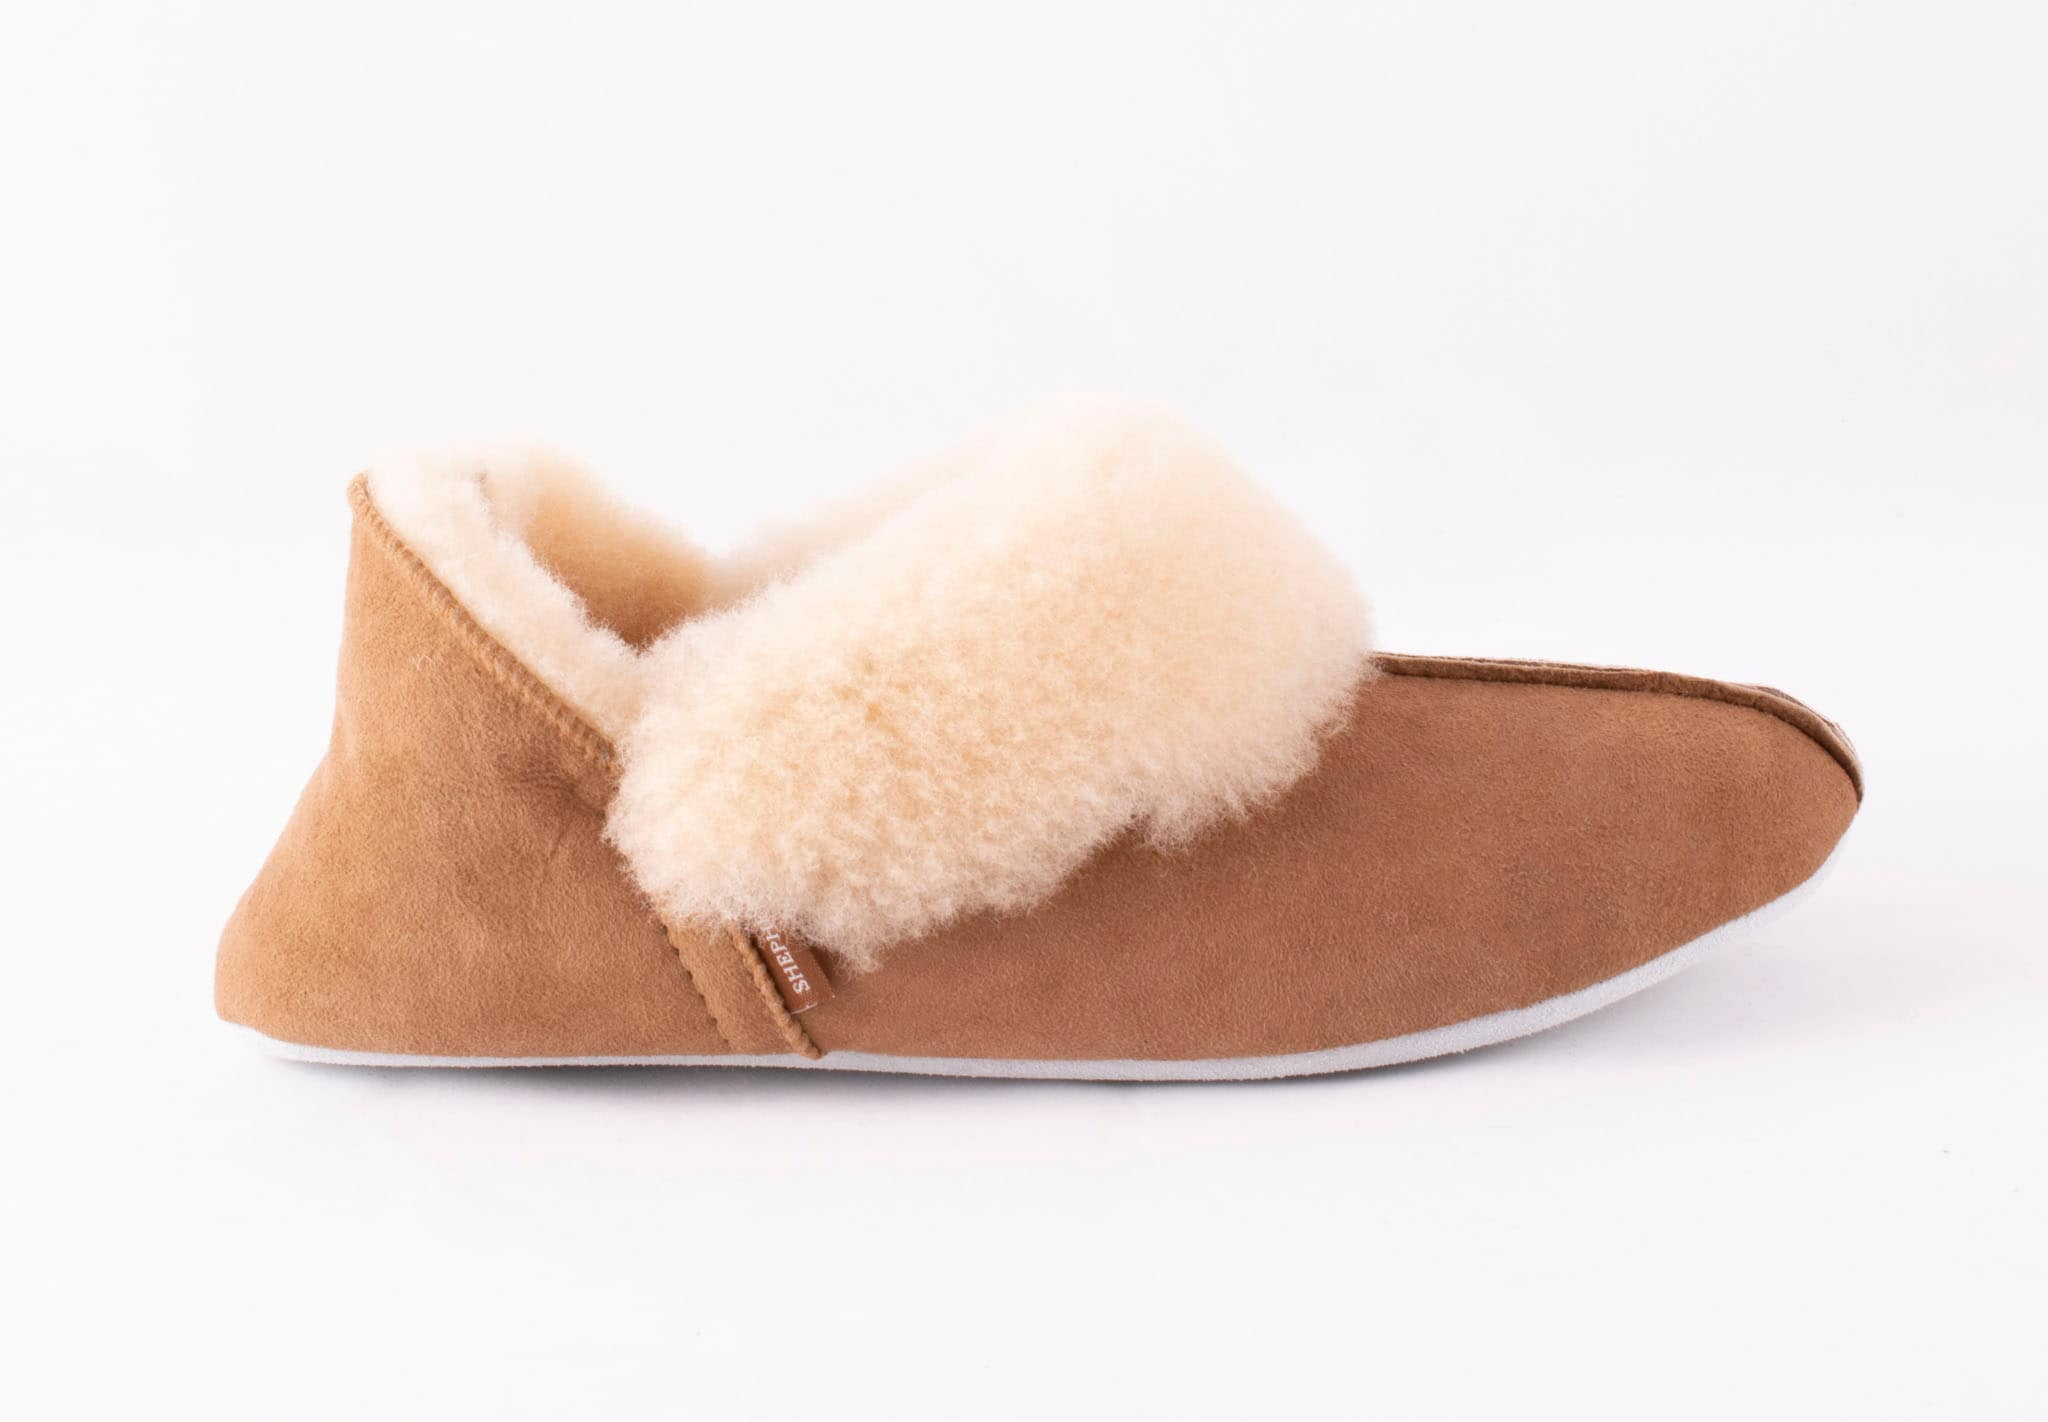 Nina sheepskin slippers